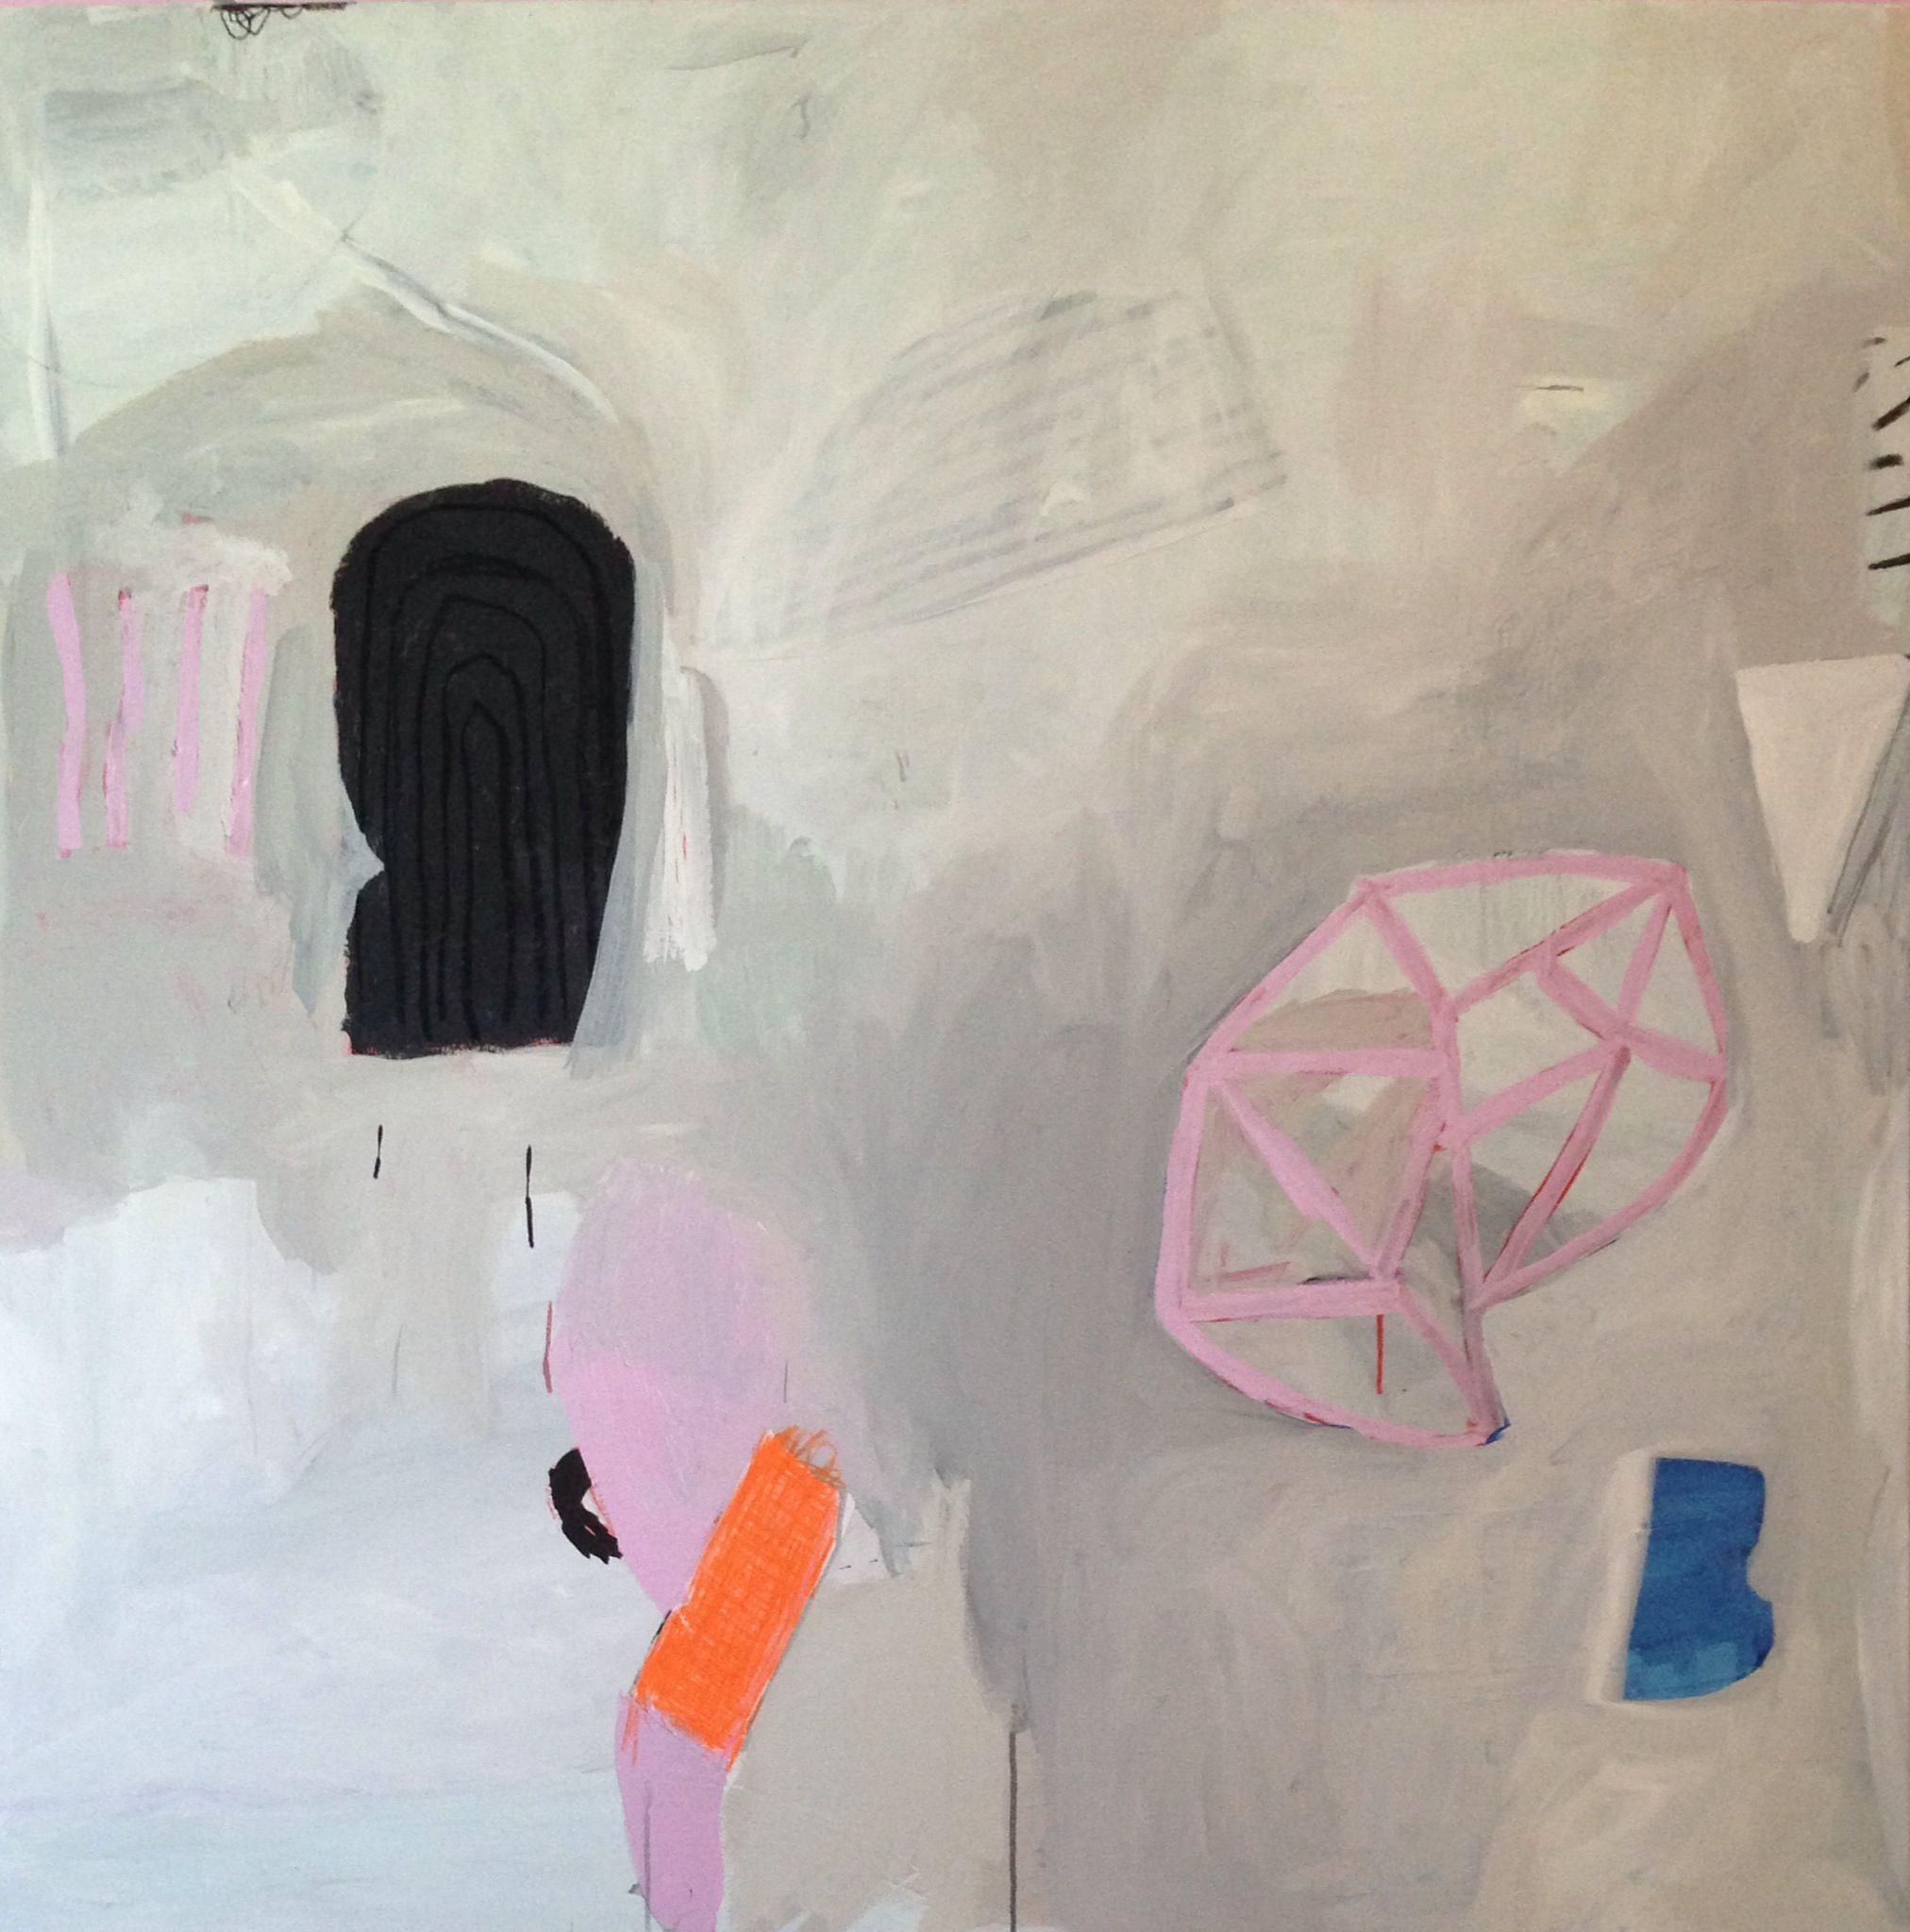 TBD mm on canvas 48x48 2014 Sarah